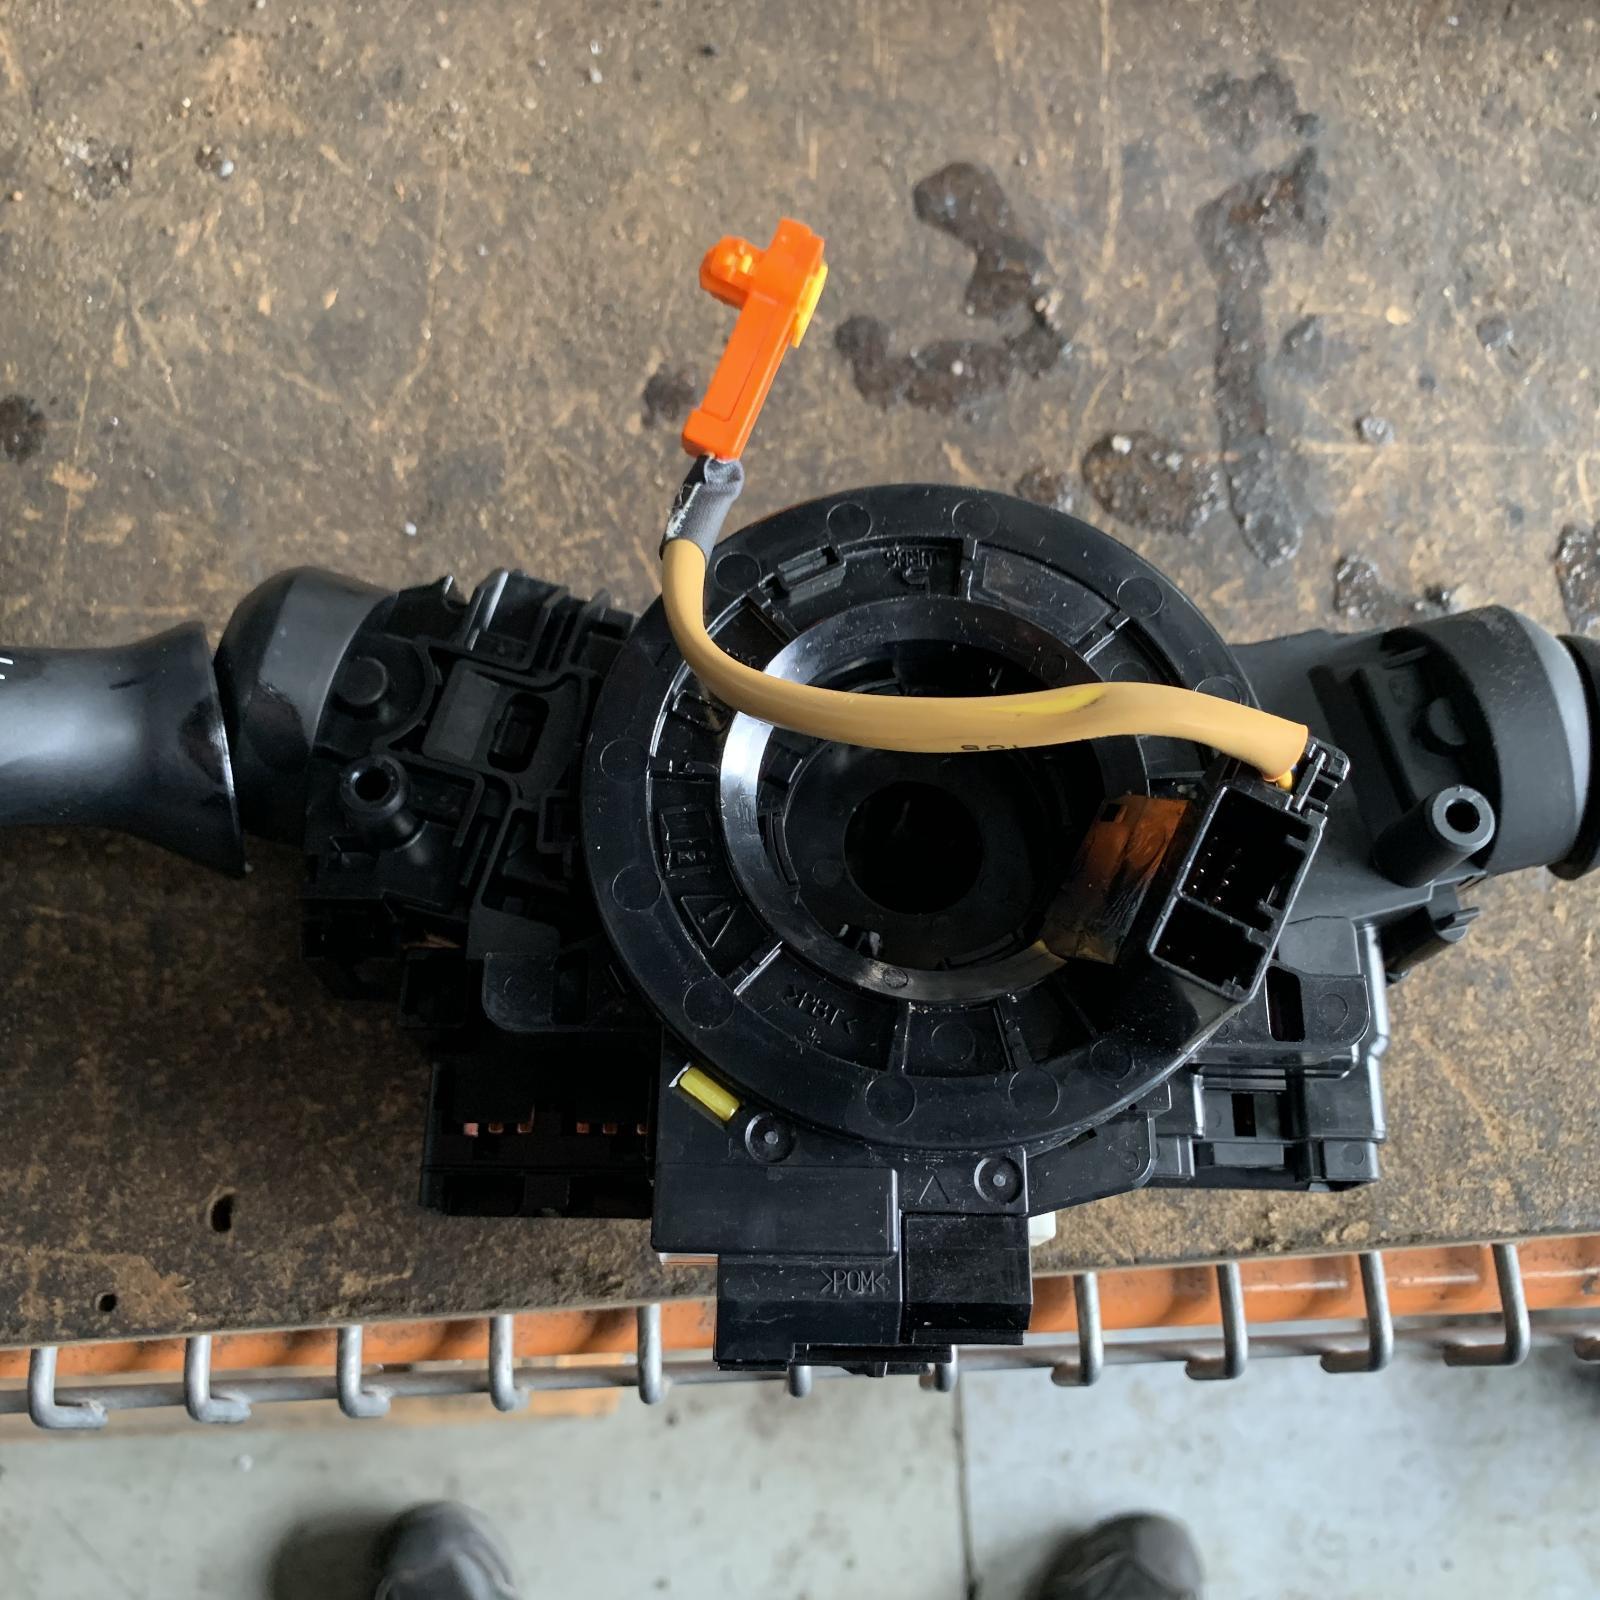 TOYOTA COROLLA, Airbag Module/Sensor, CLOCKSPRING, ZRE152/153R, W/ STEERING WHEEL CONTROL TYPE, 03/07-10/13